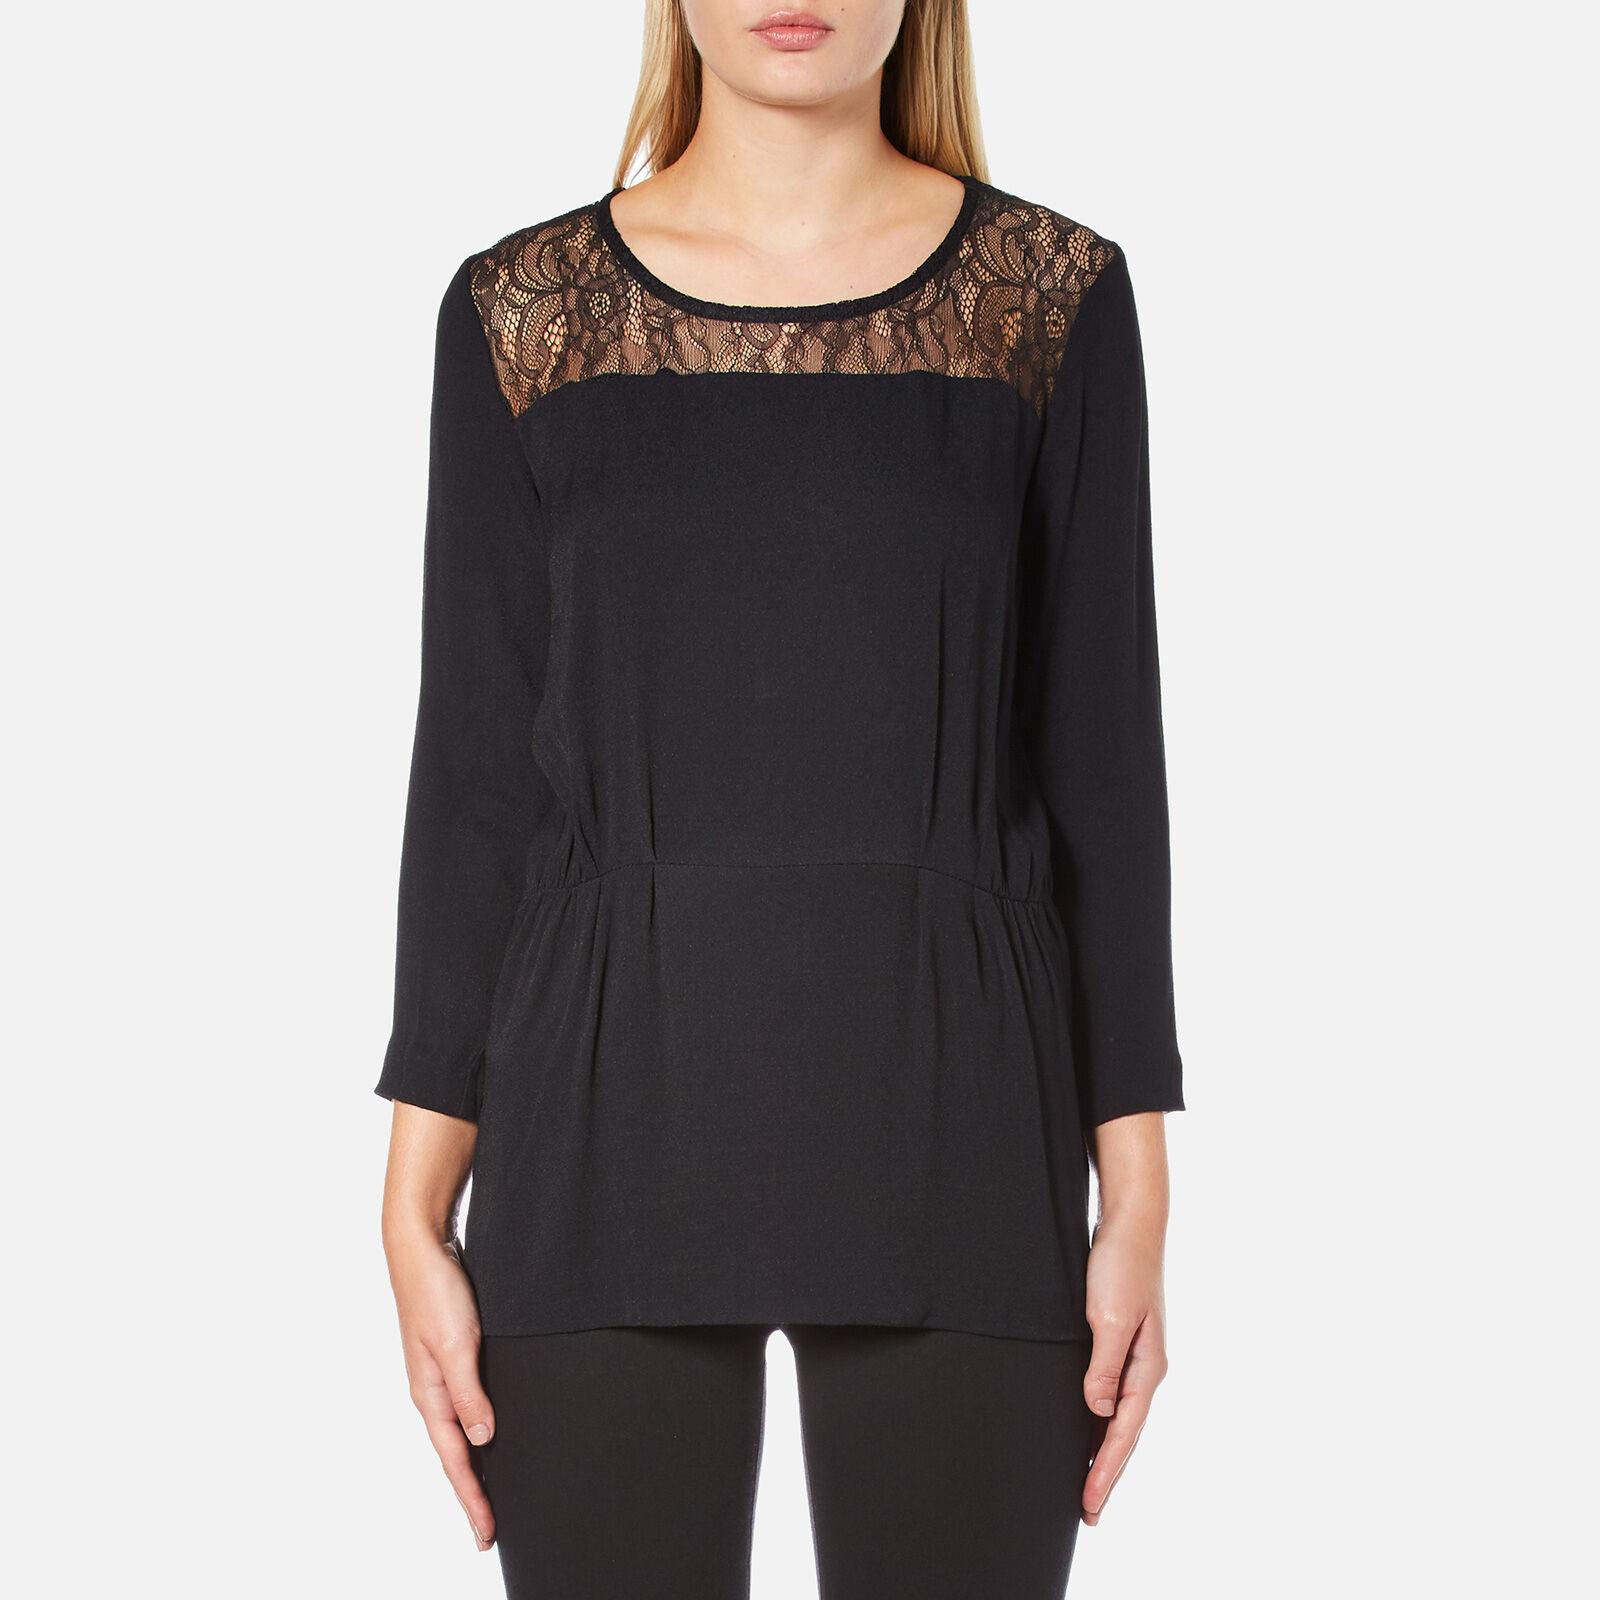 Selected Femme Women's Mussa Lace Top - Black - EU 34/UK 6 - Black